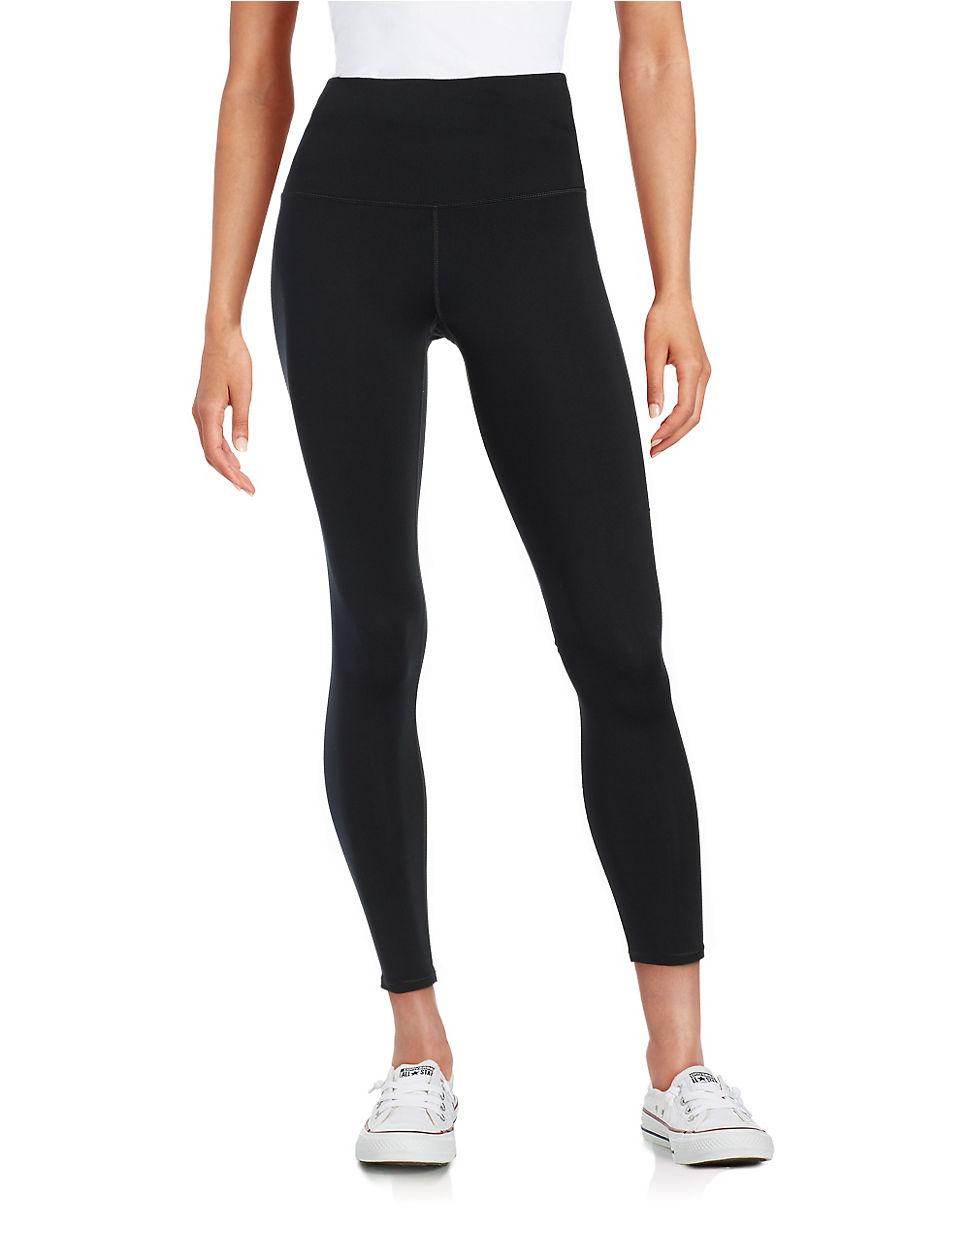 calvin klein high waisted active leggings in black lyst. Black Bedroom Furniture Sets. Home Design Ideas